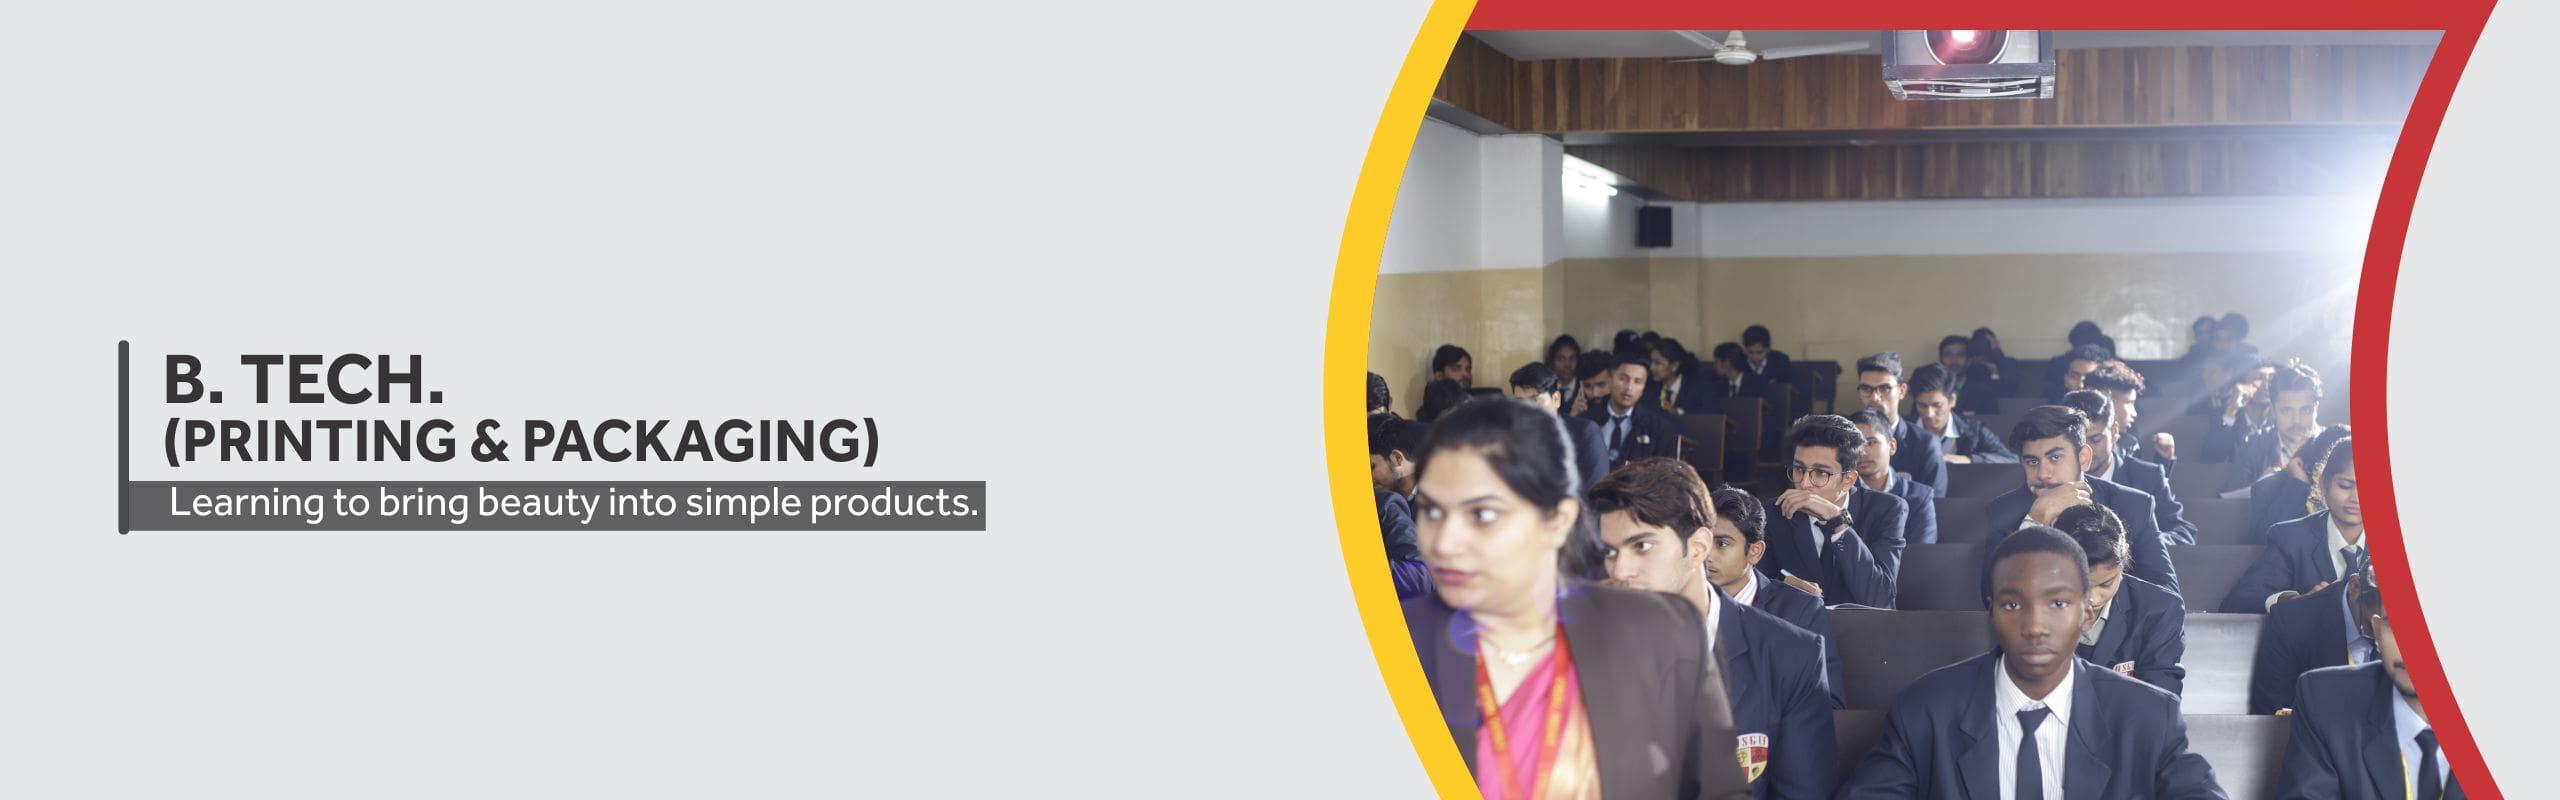 B. Tech. PP (Printing and Packaging) in Haryana, India